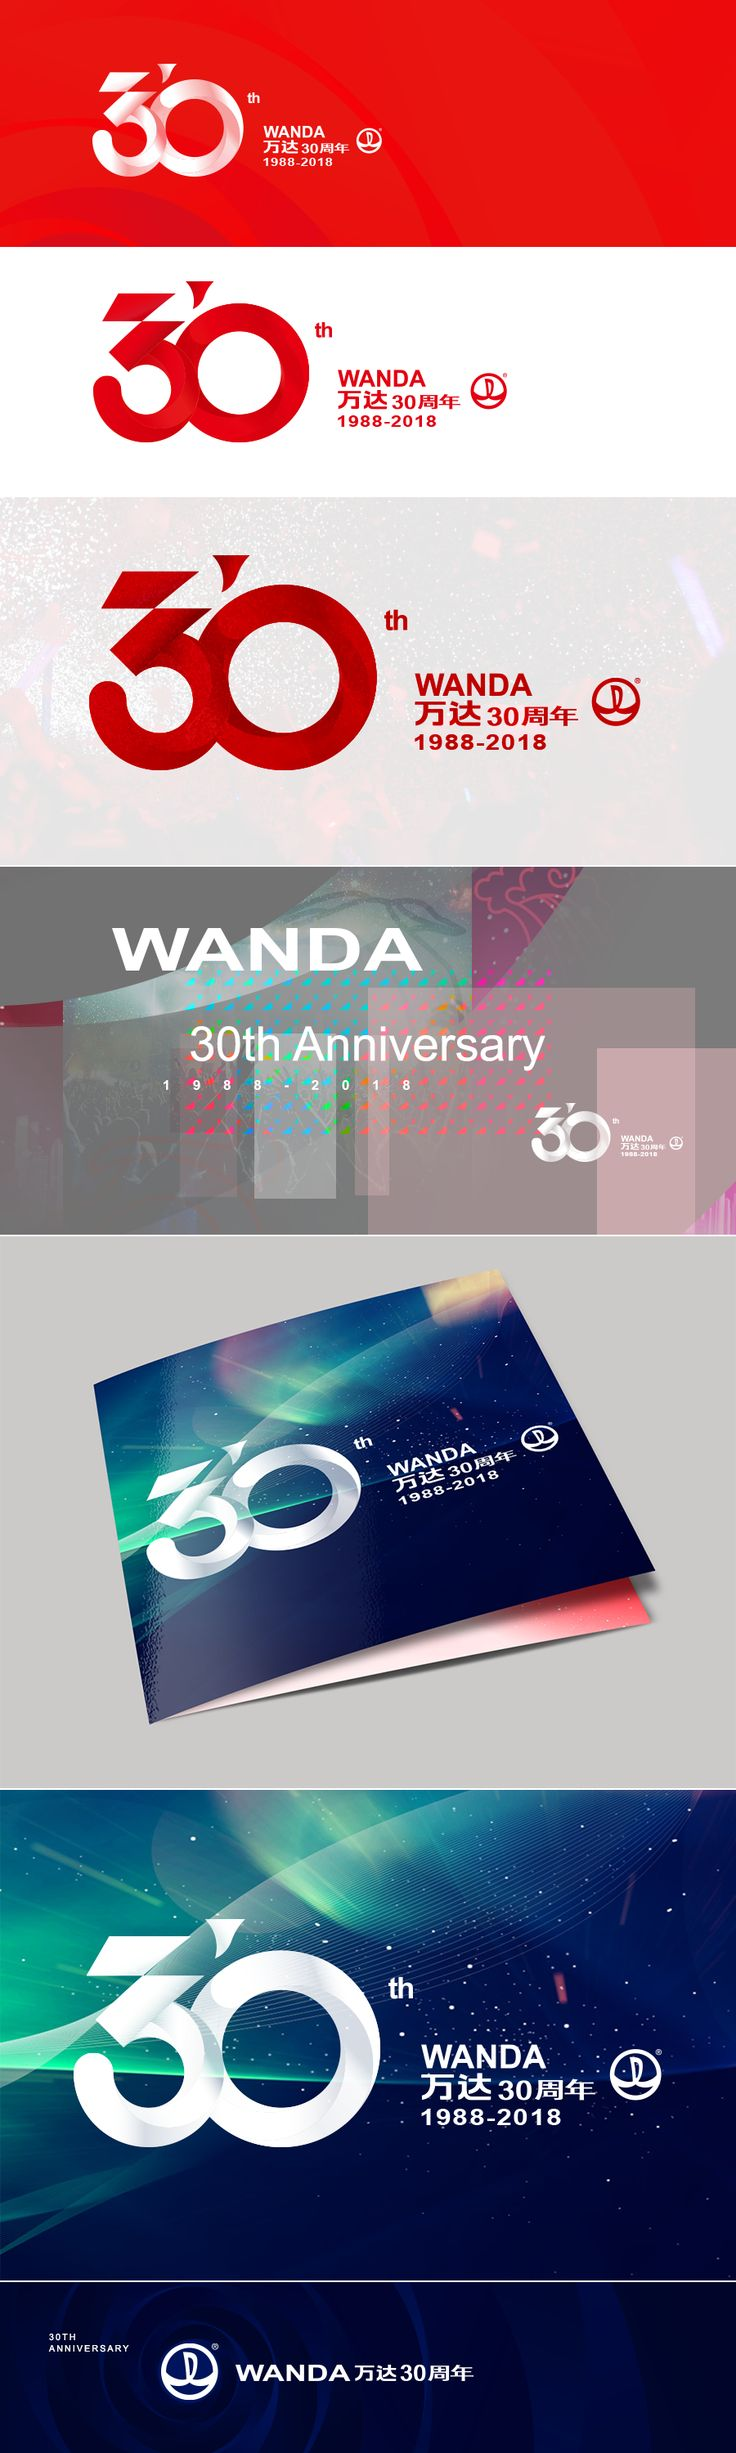 Wanda 30th anniversary logo design